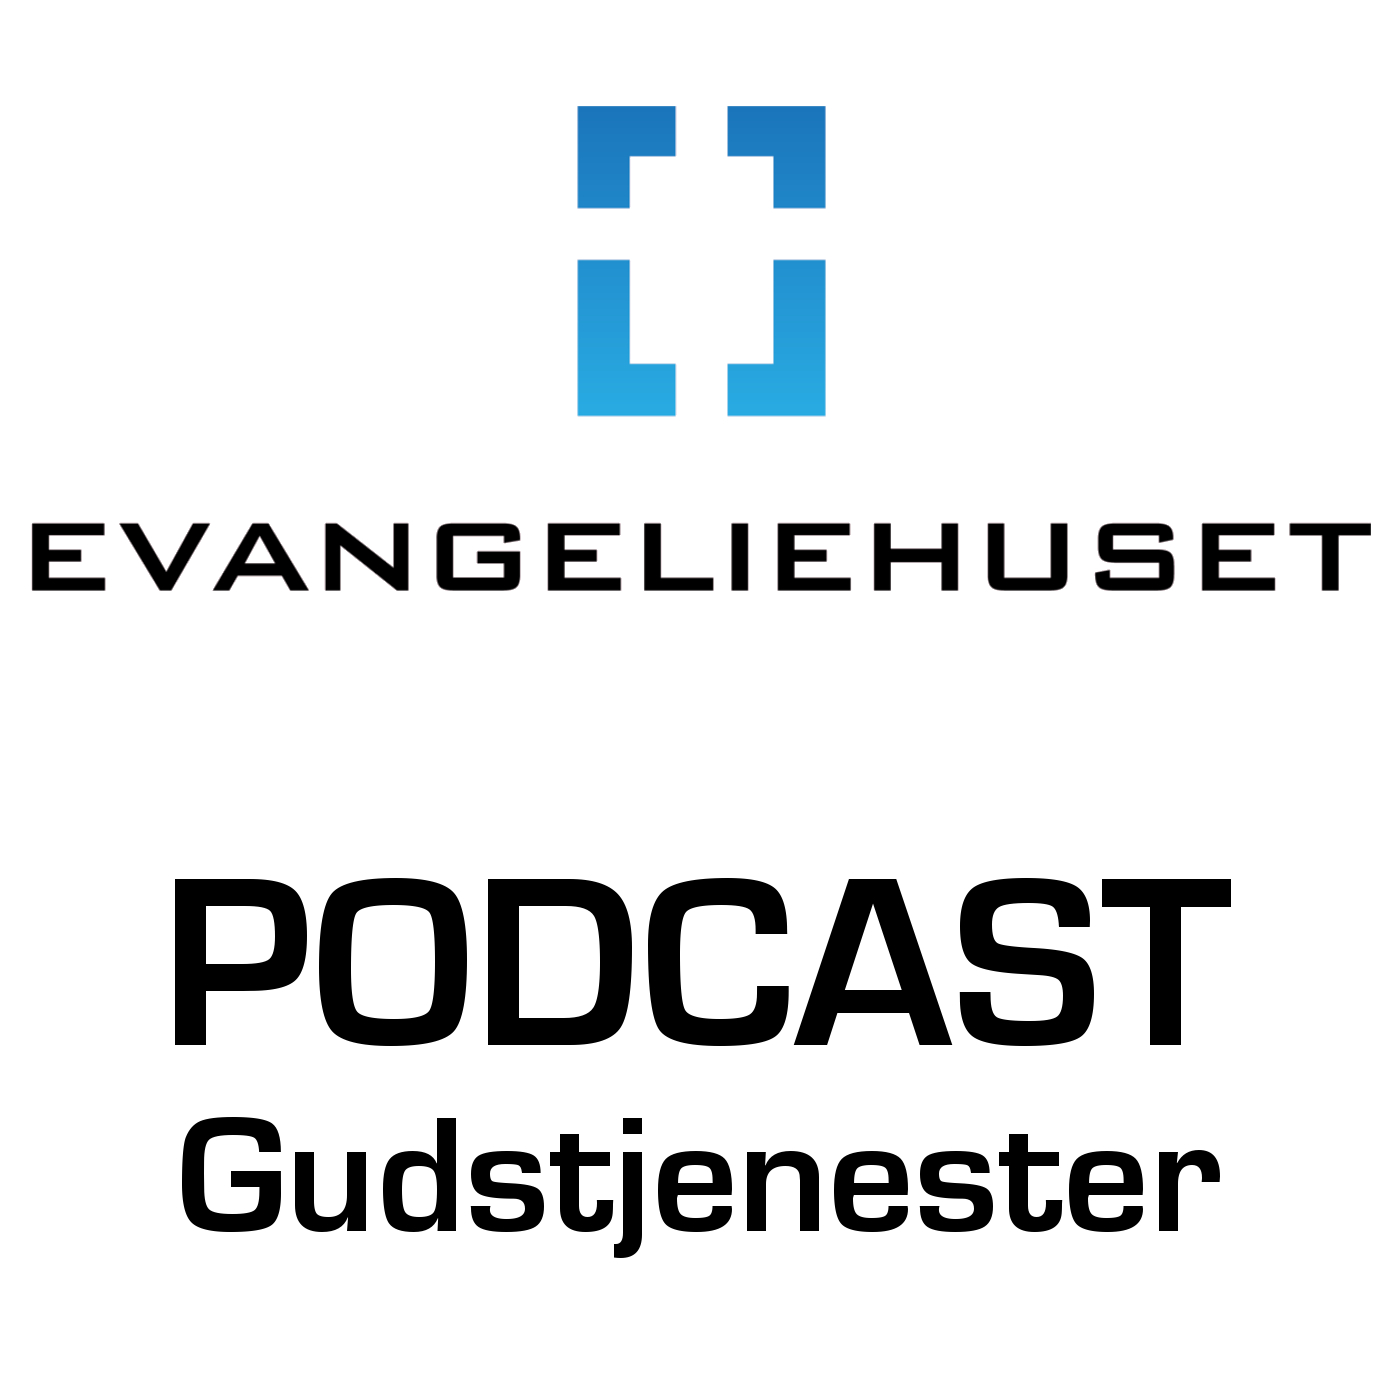 Evangeliehuset Åsgreina - Gudstjenester